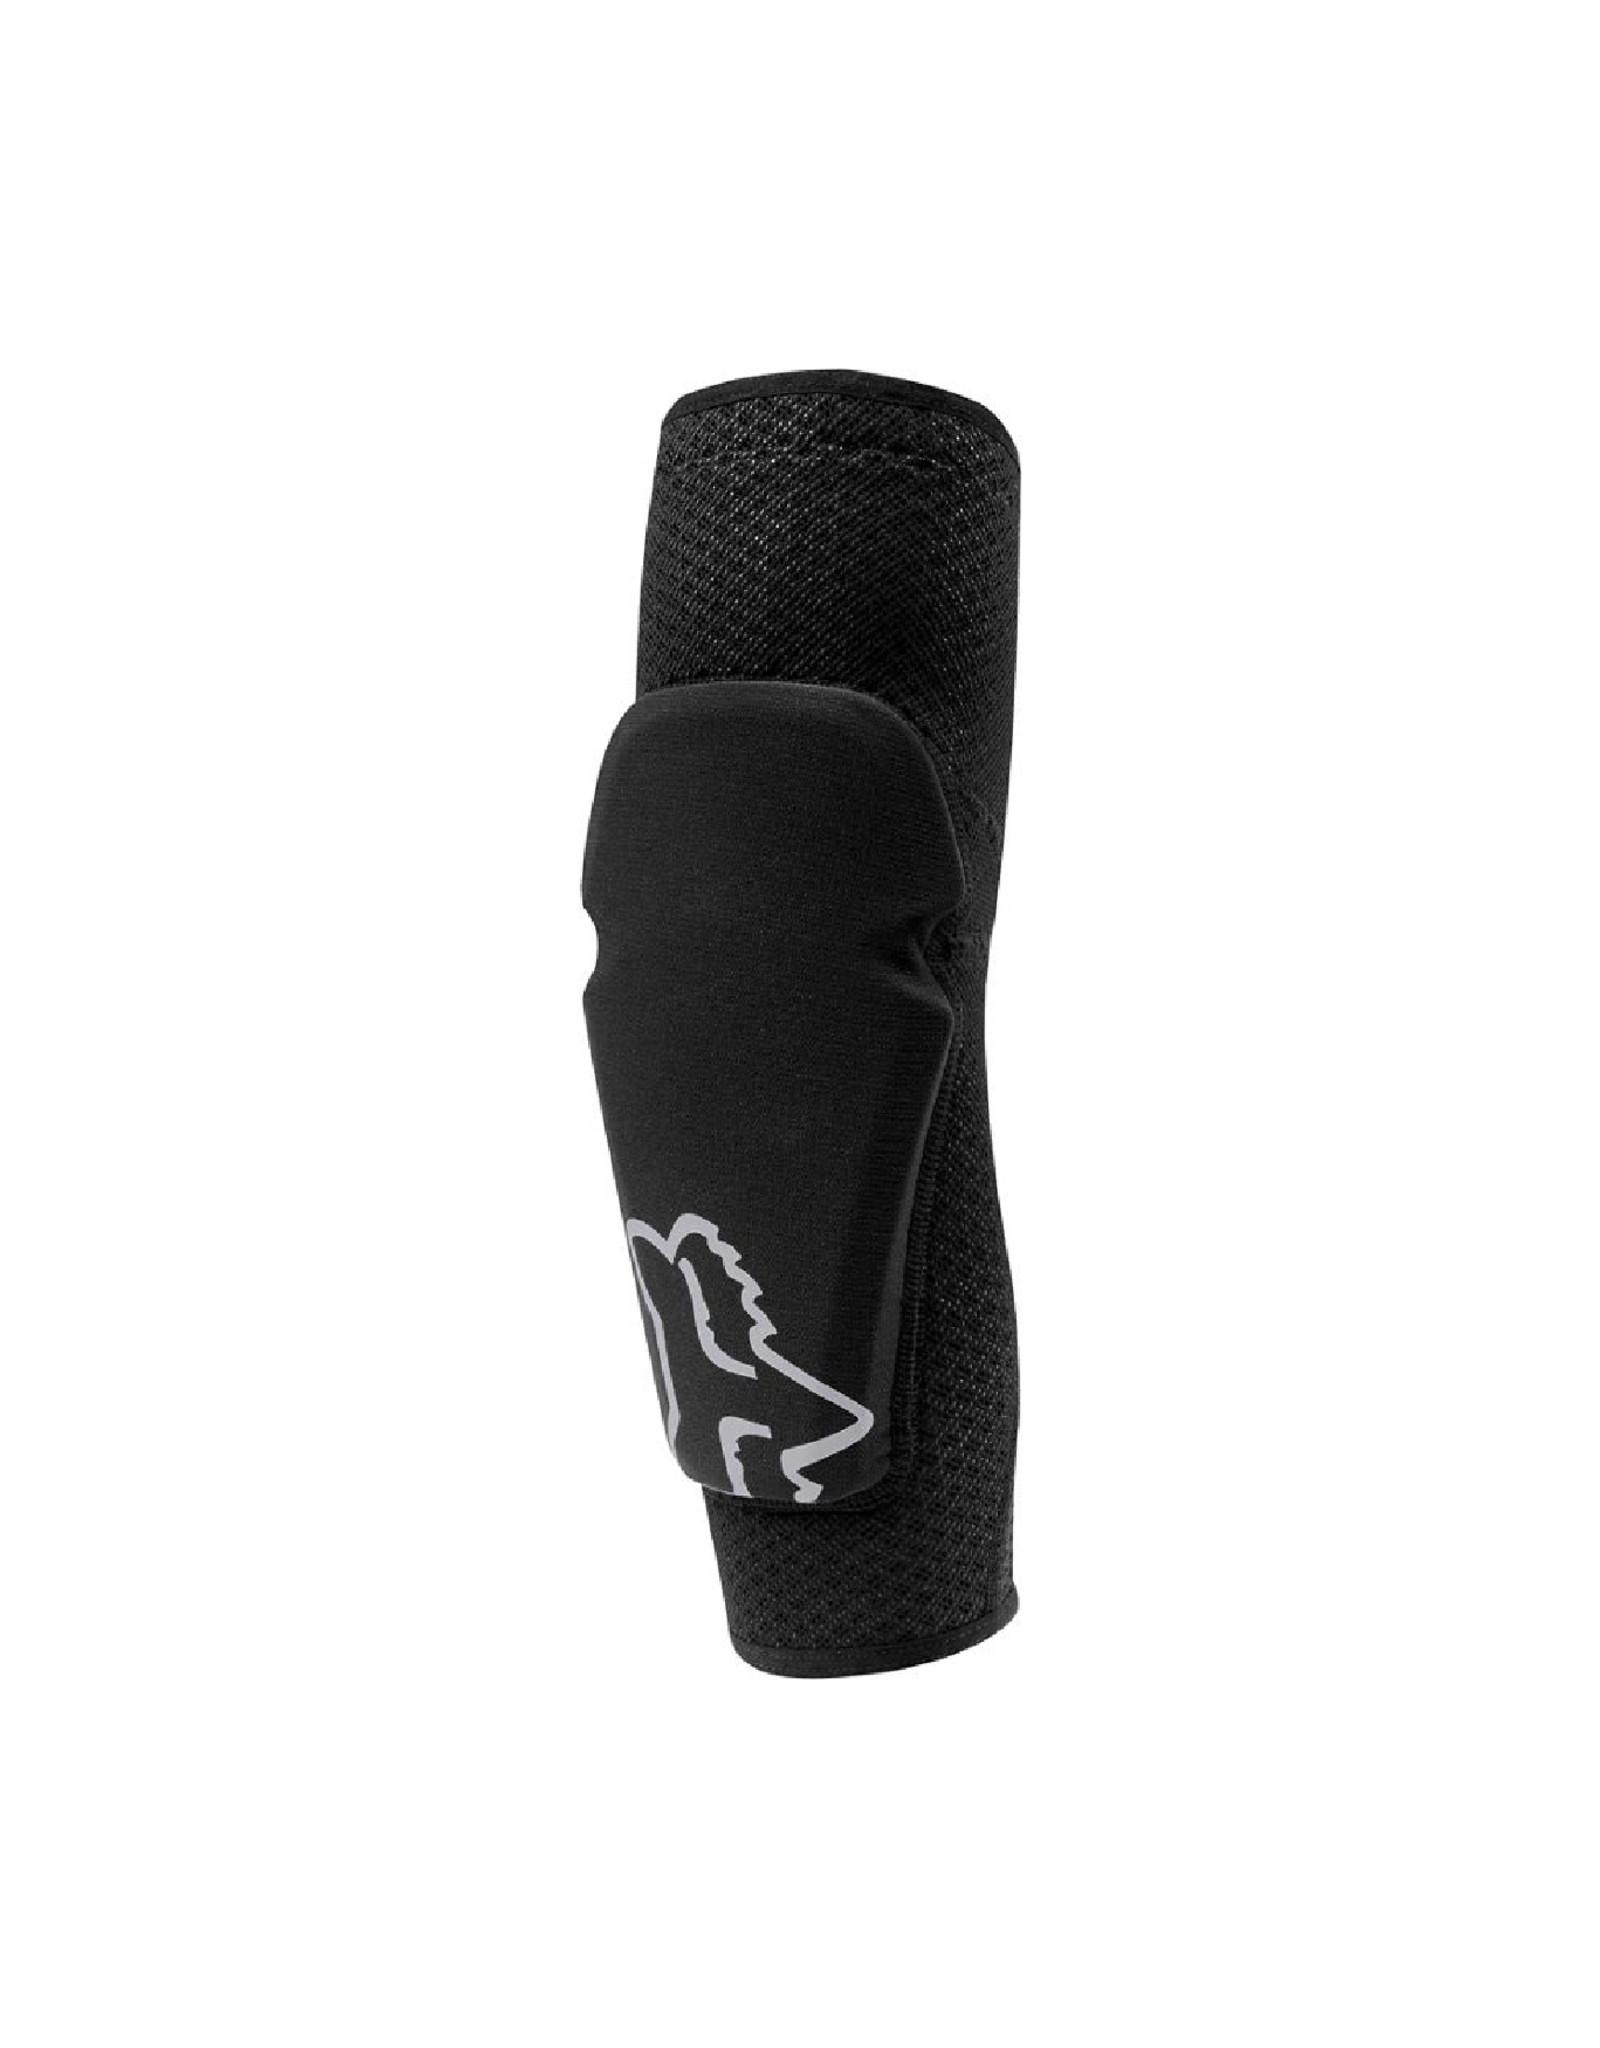 Enduro Elbow Sleeve Fox